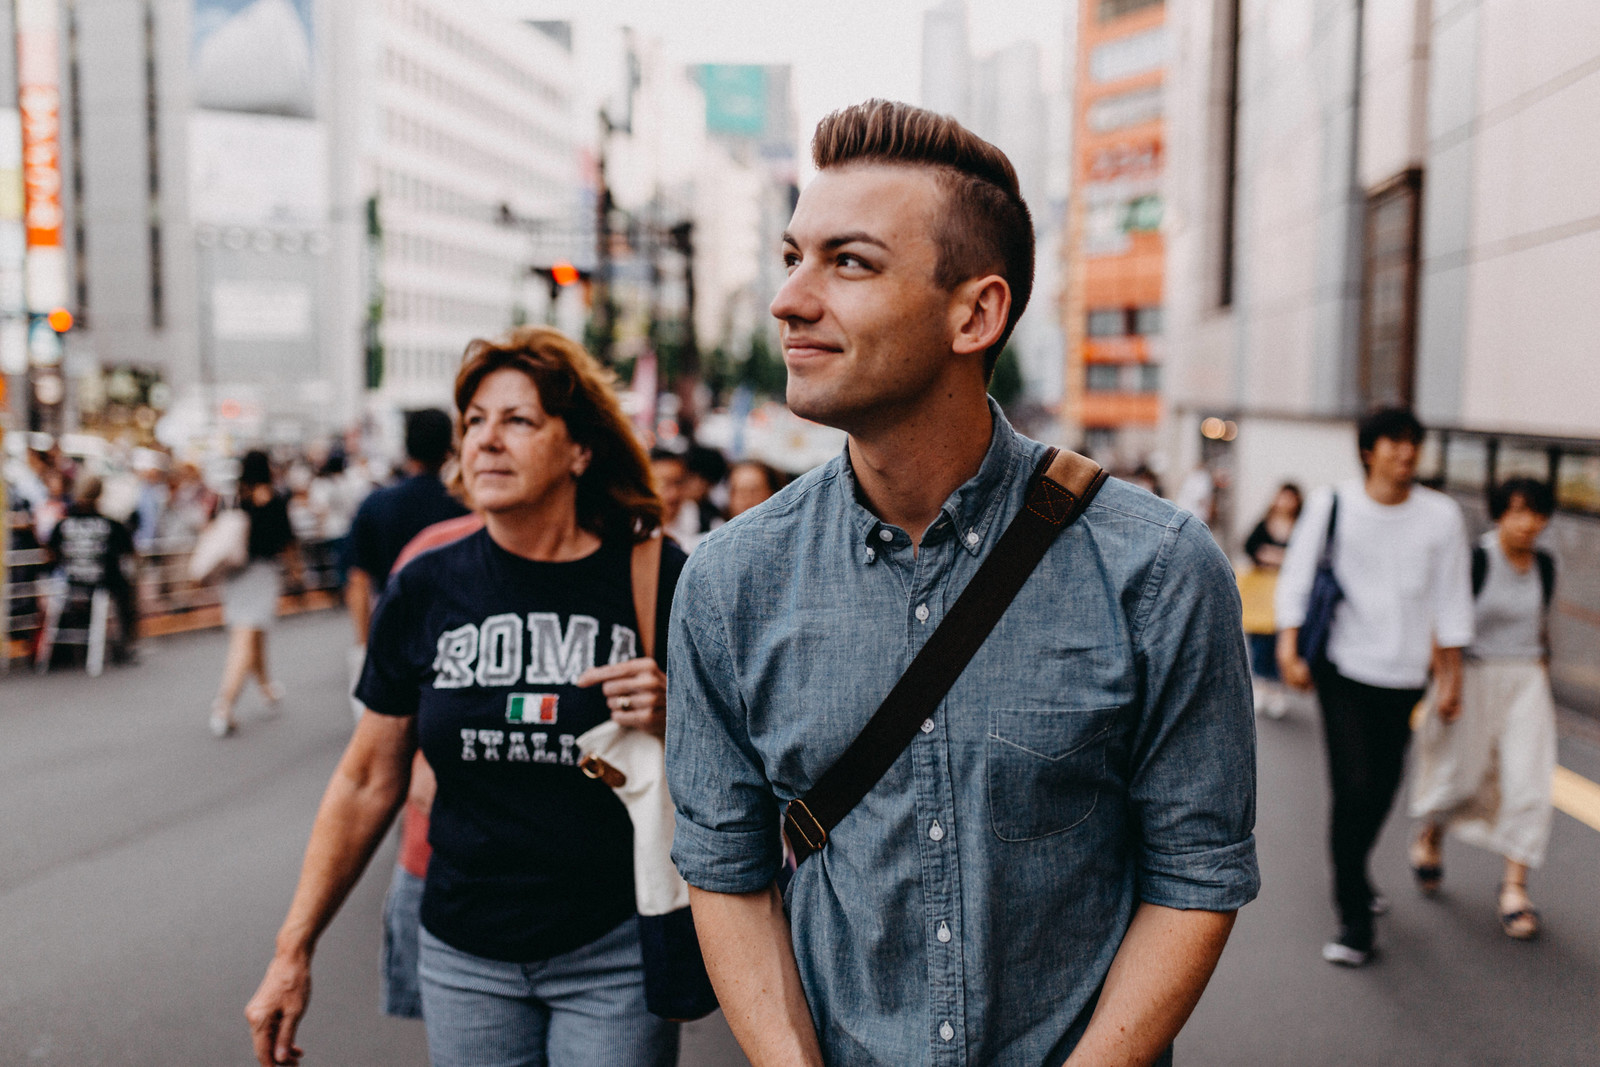 Gay backpacker and mom walking through Shinjuku on first visit to Tokyo Japan